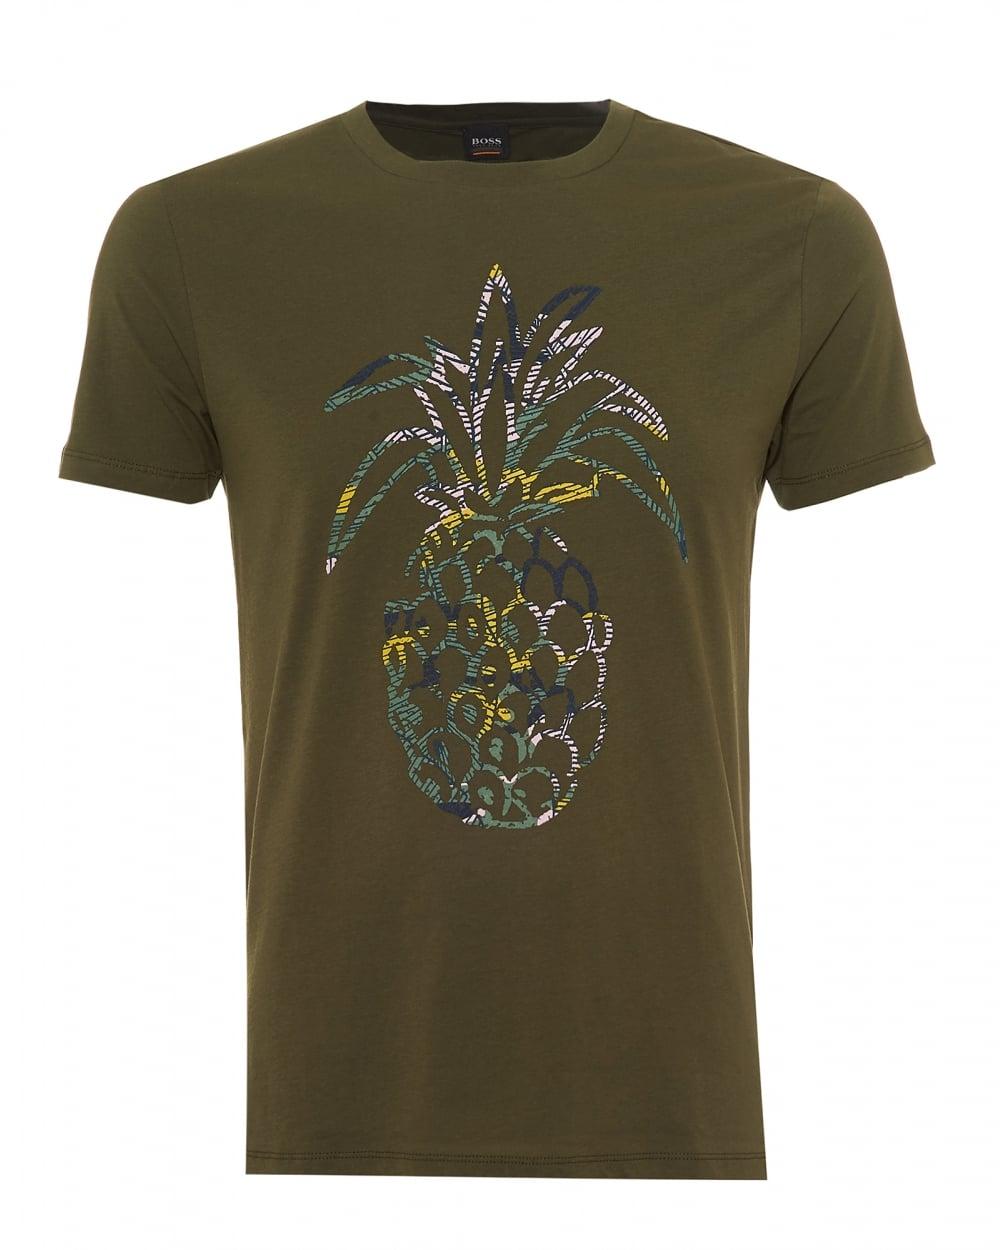 cd9079604 Hugo Boss Orange Mens Tauno 1 T-Shirt, Pineapple Print Olive Green Tee